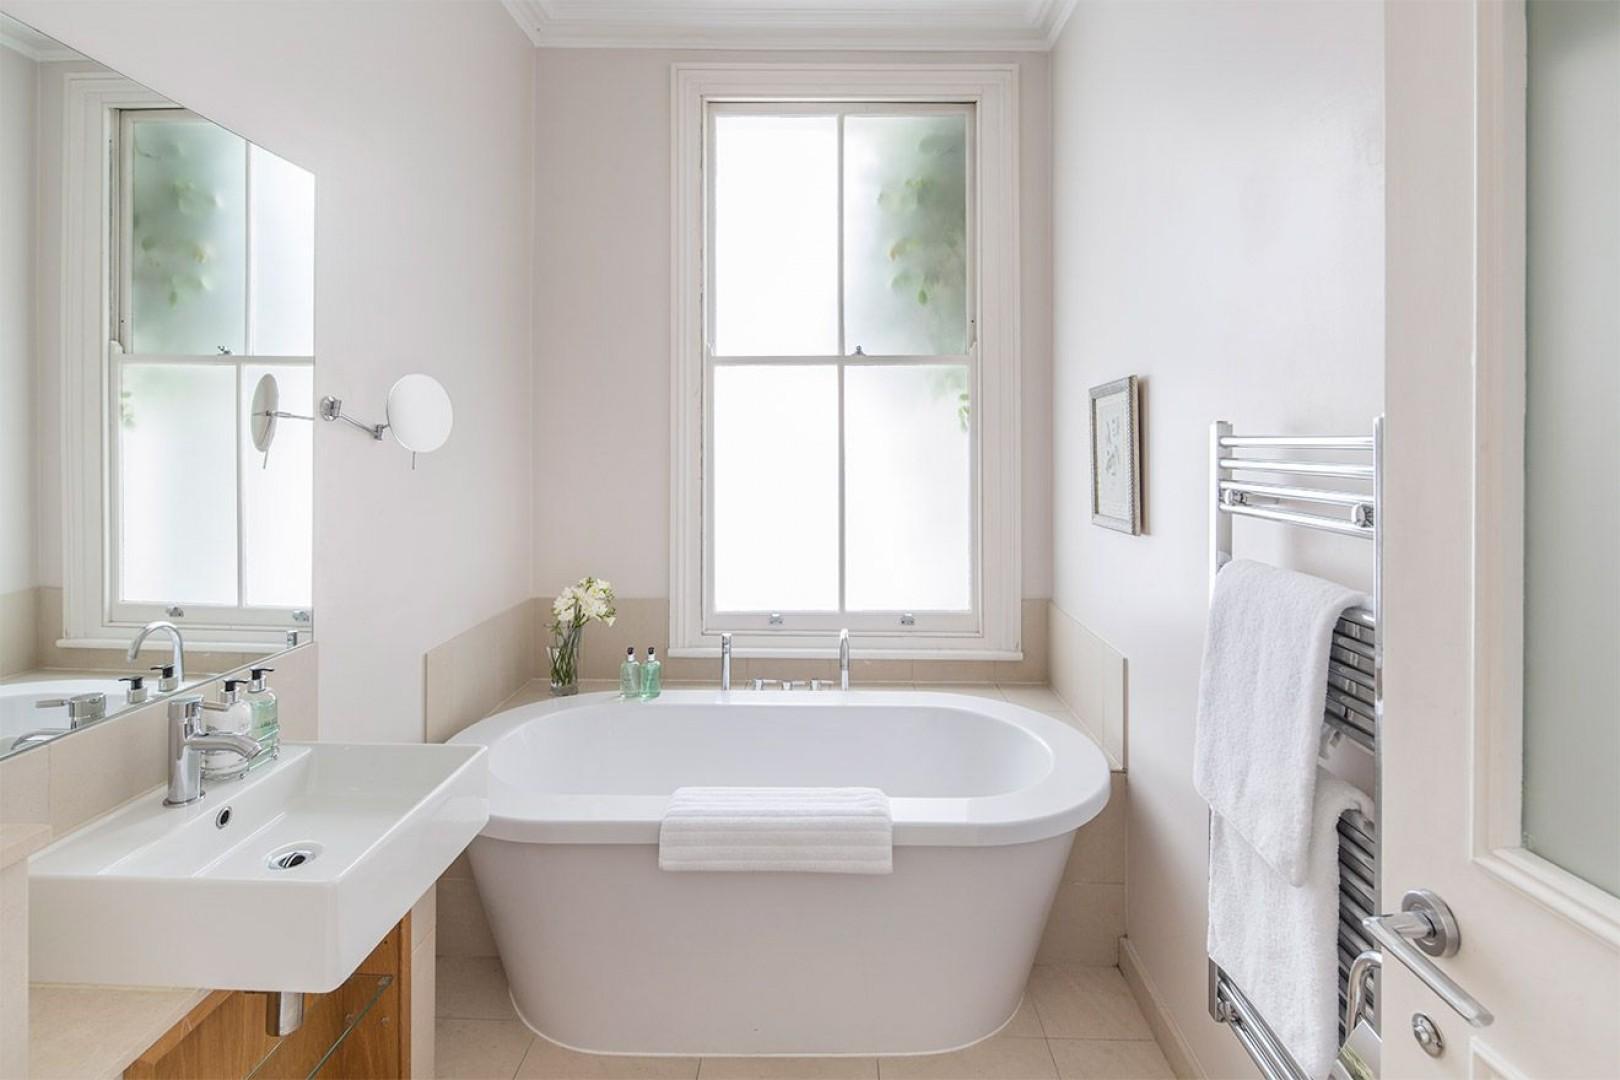 Enjoy a long soak in the luxurious tub in the en suite bathroom